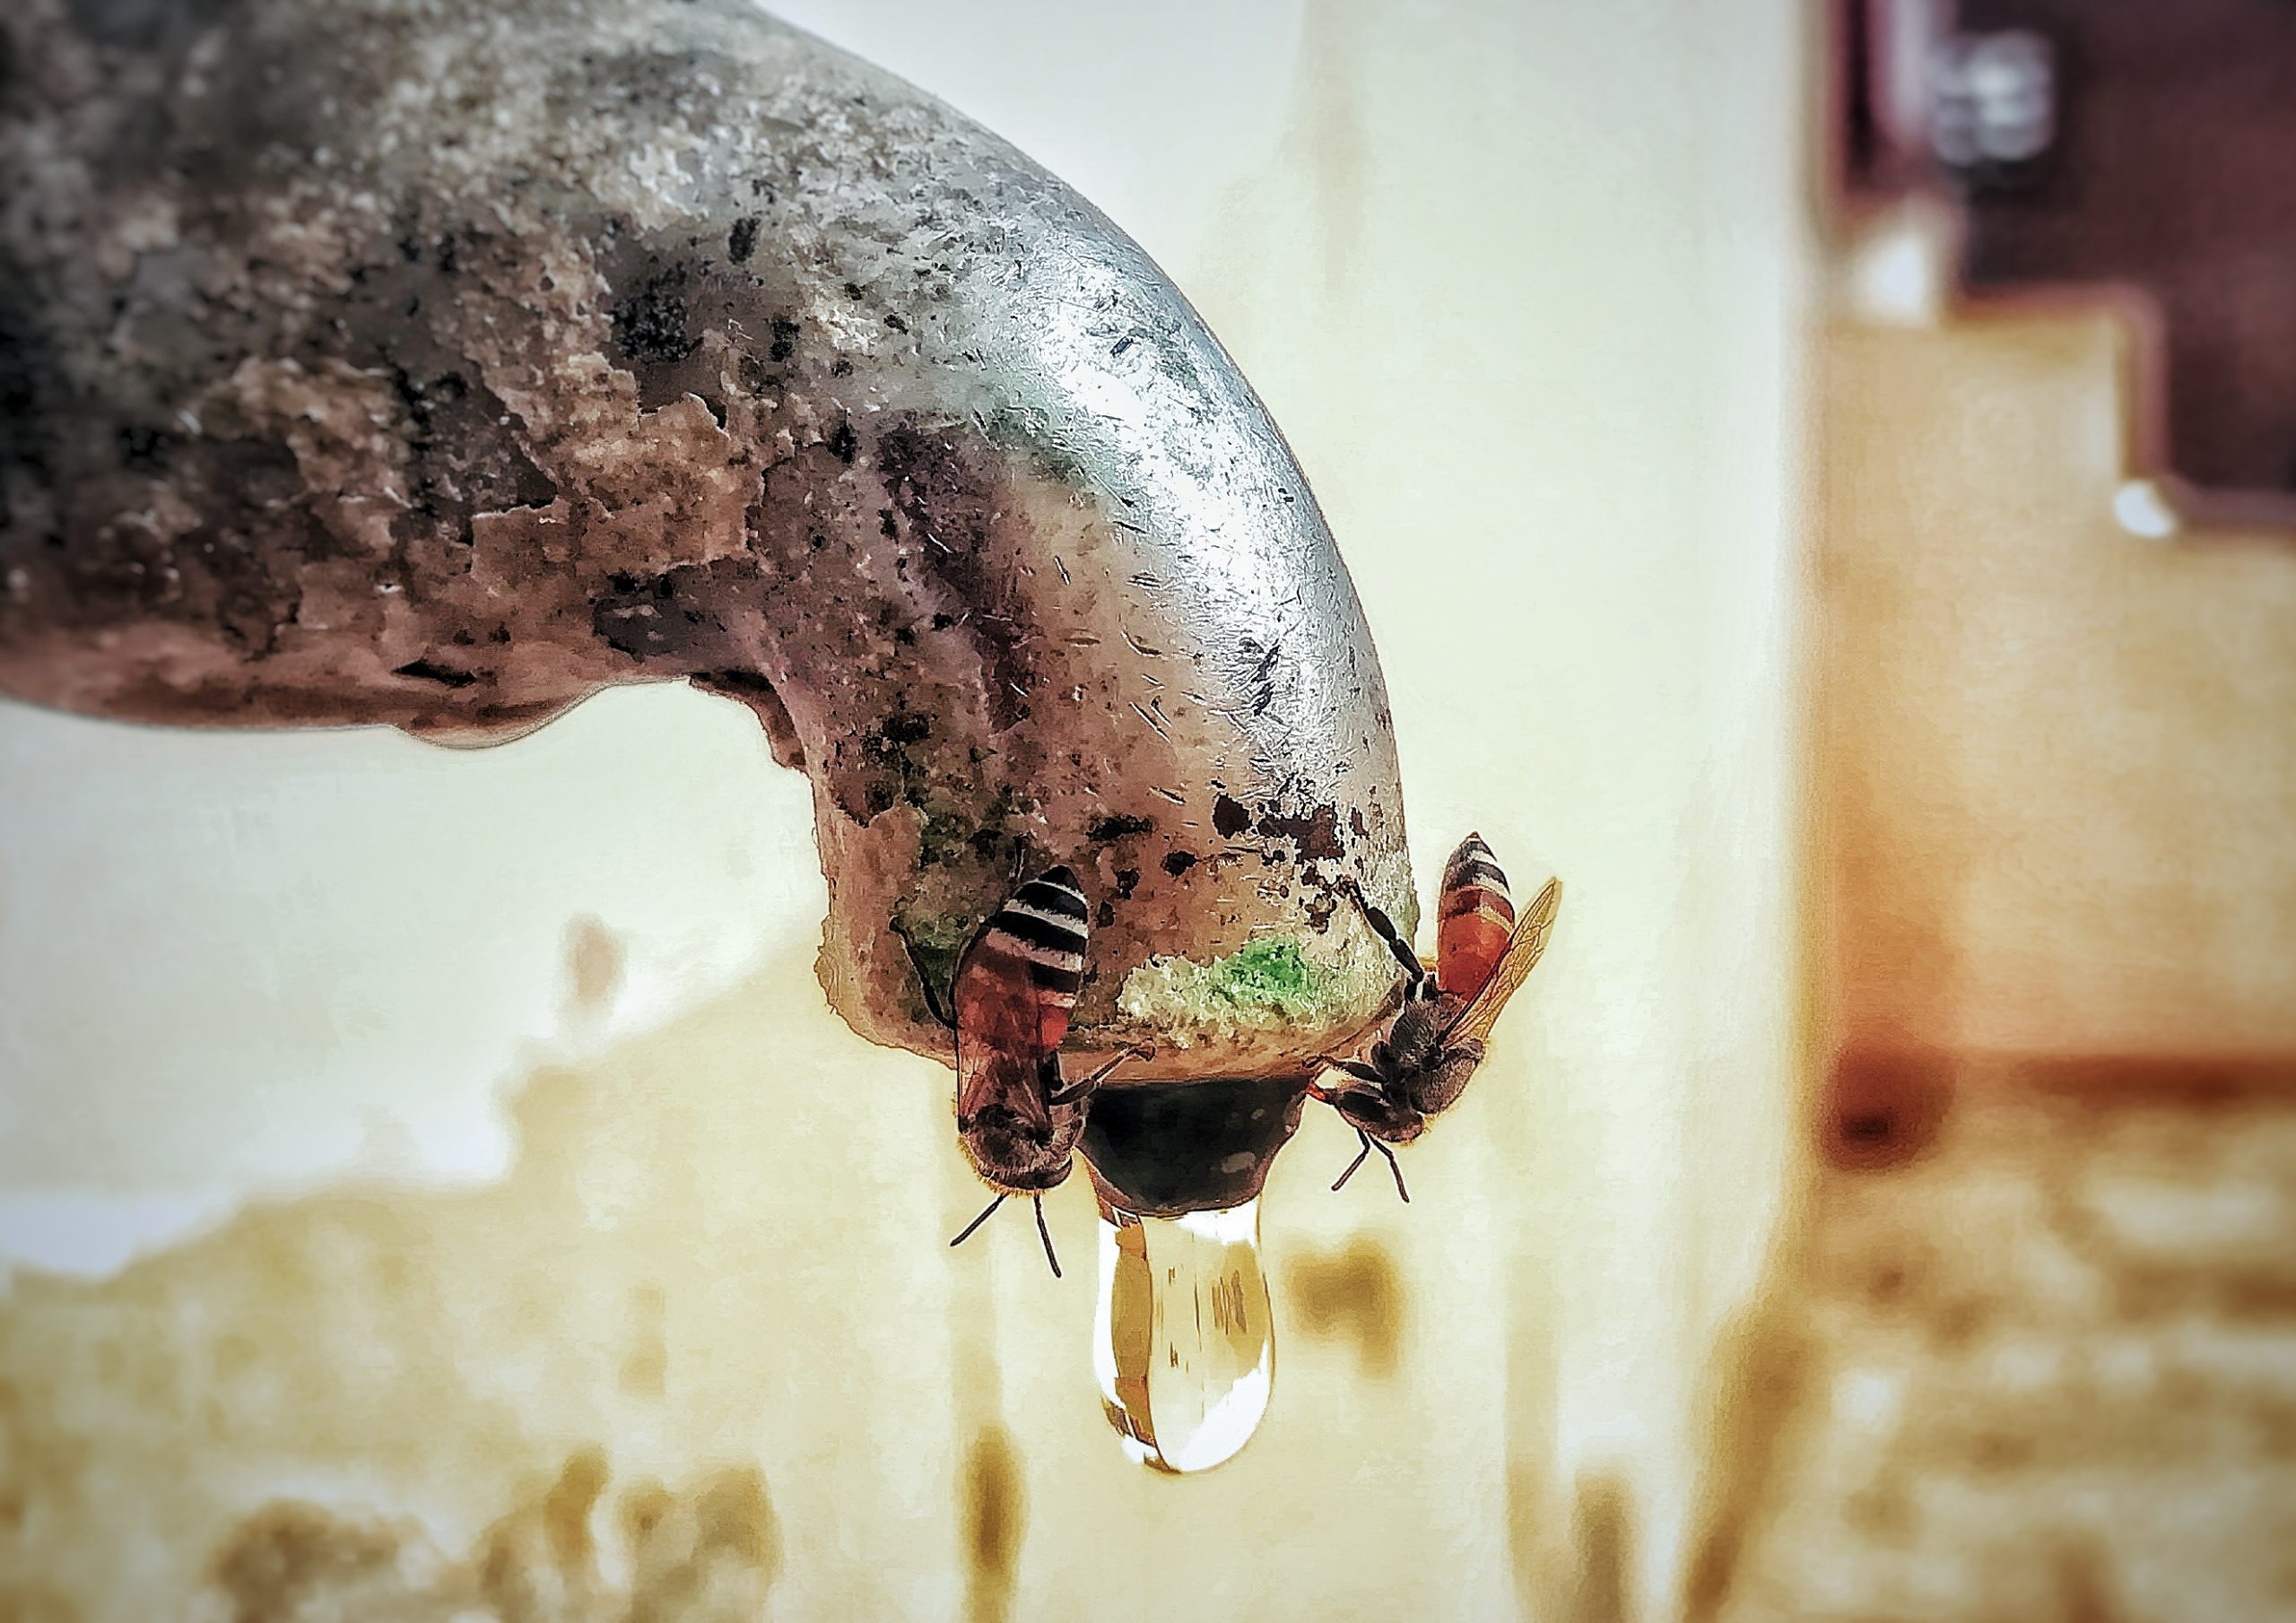 Honeybee on a tap nozzle